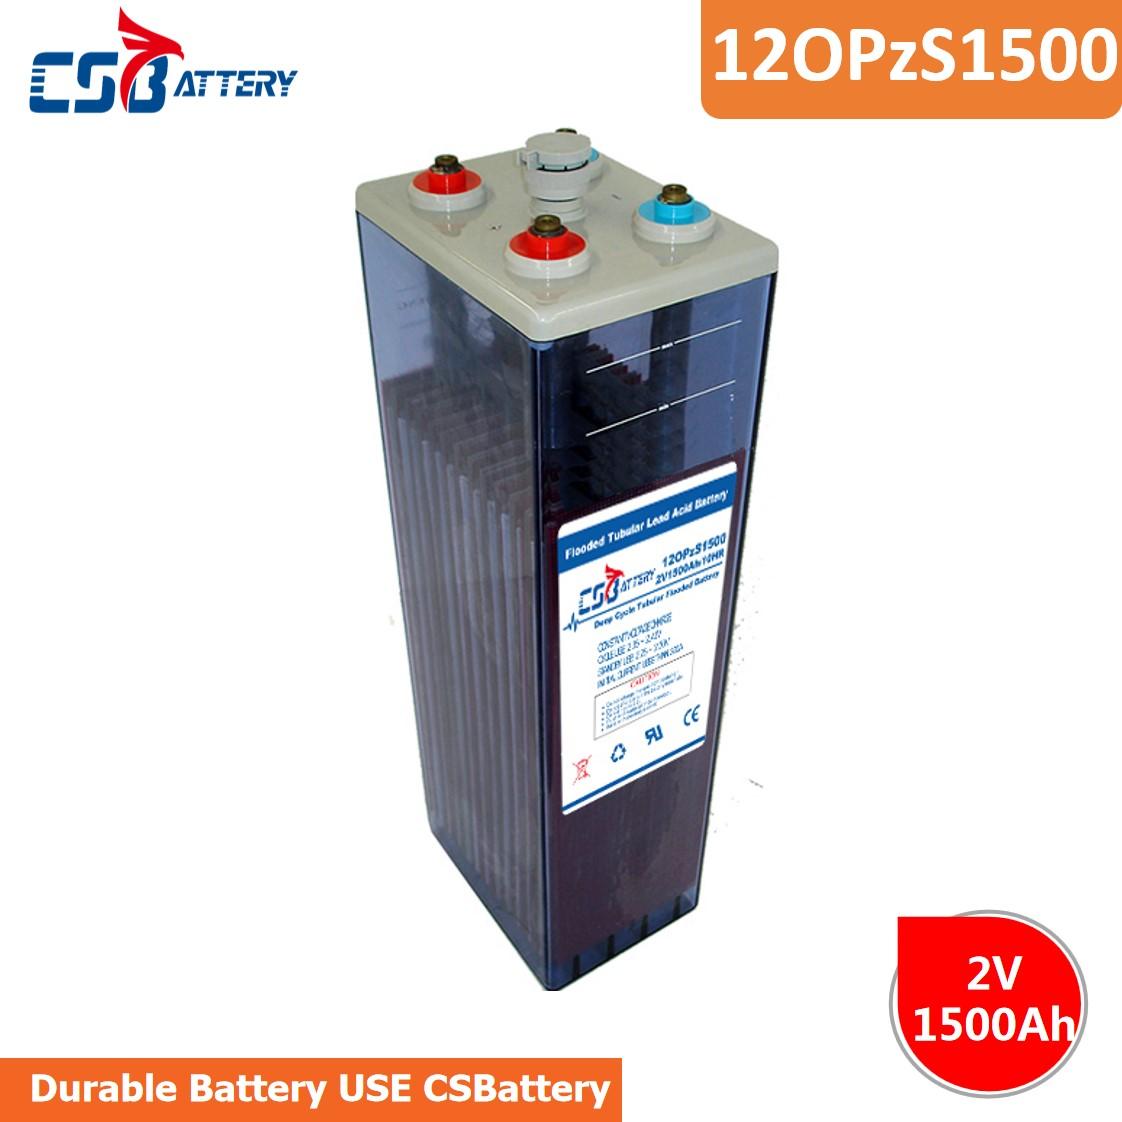 Csbattery 2V1500ah Tubular Opzs Battery for TelecomeUPSRailwaySecurityMedicalAlarmCableTVAppliation